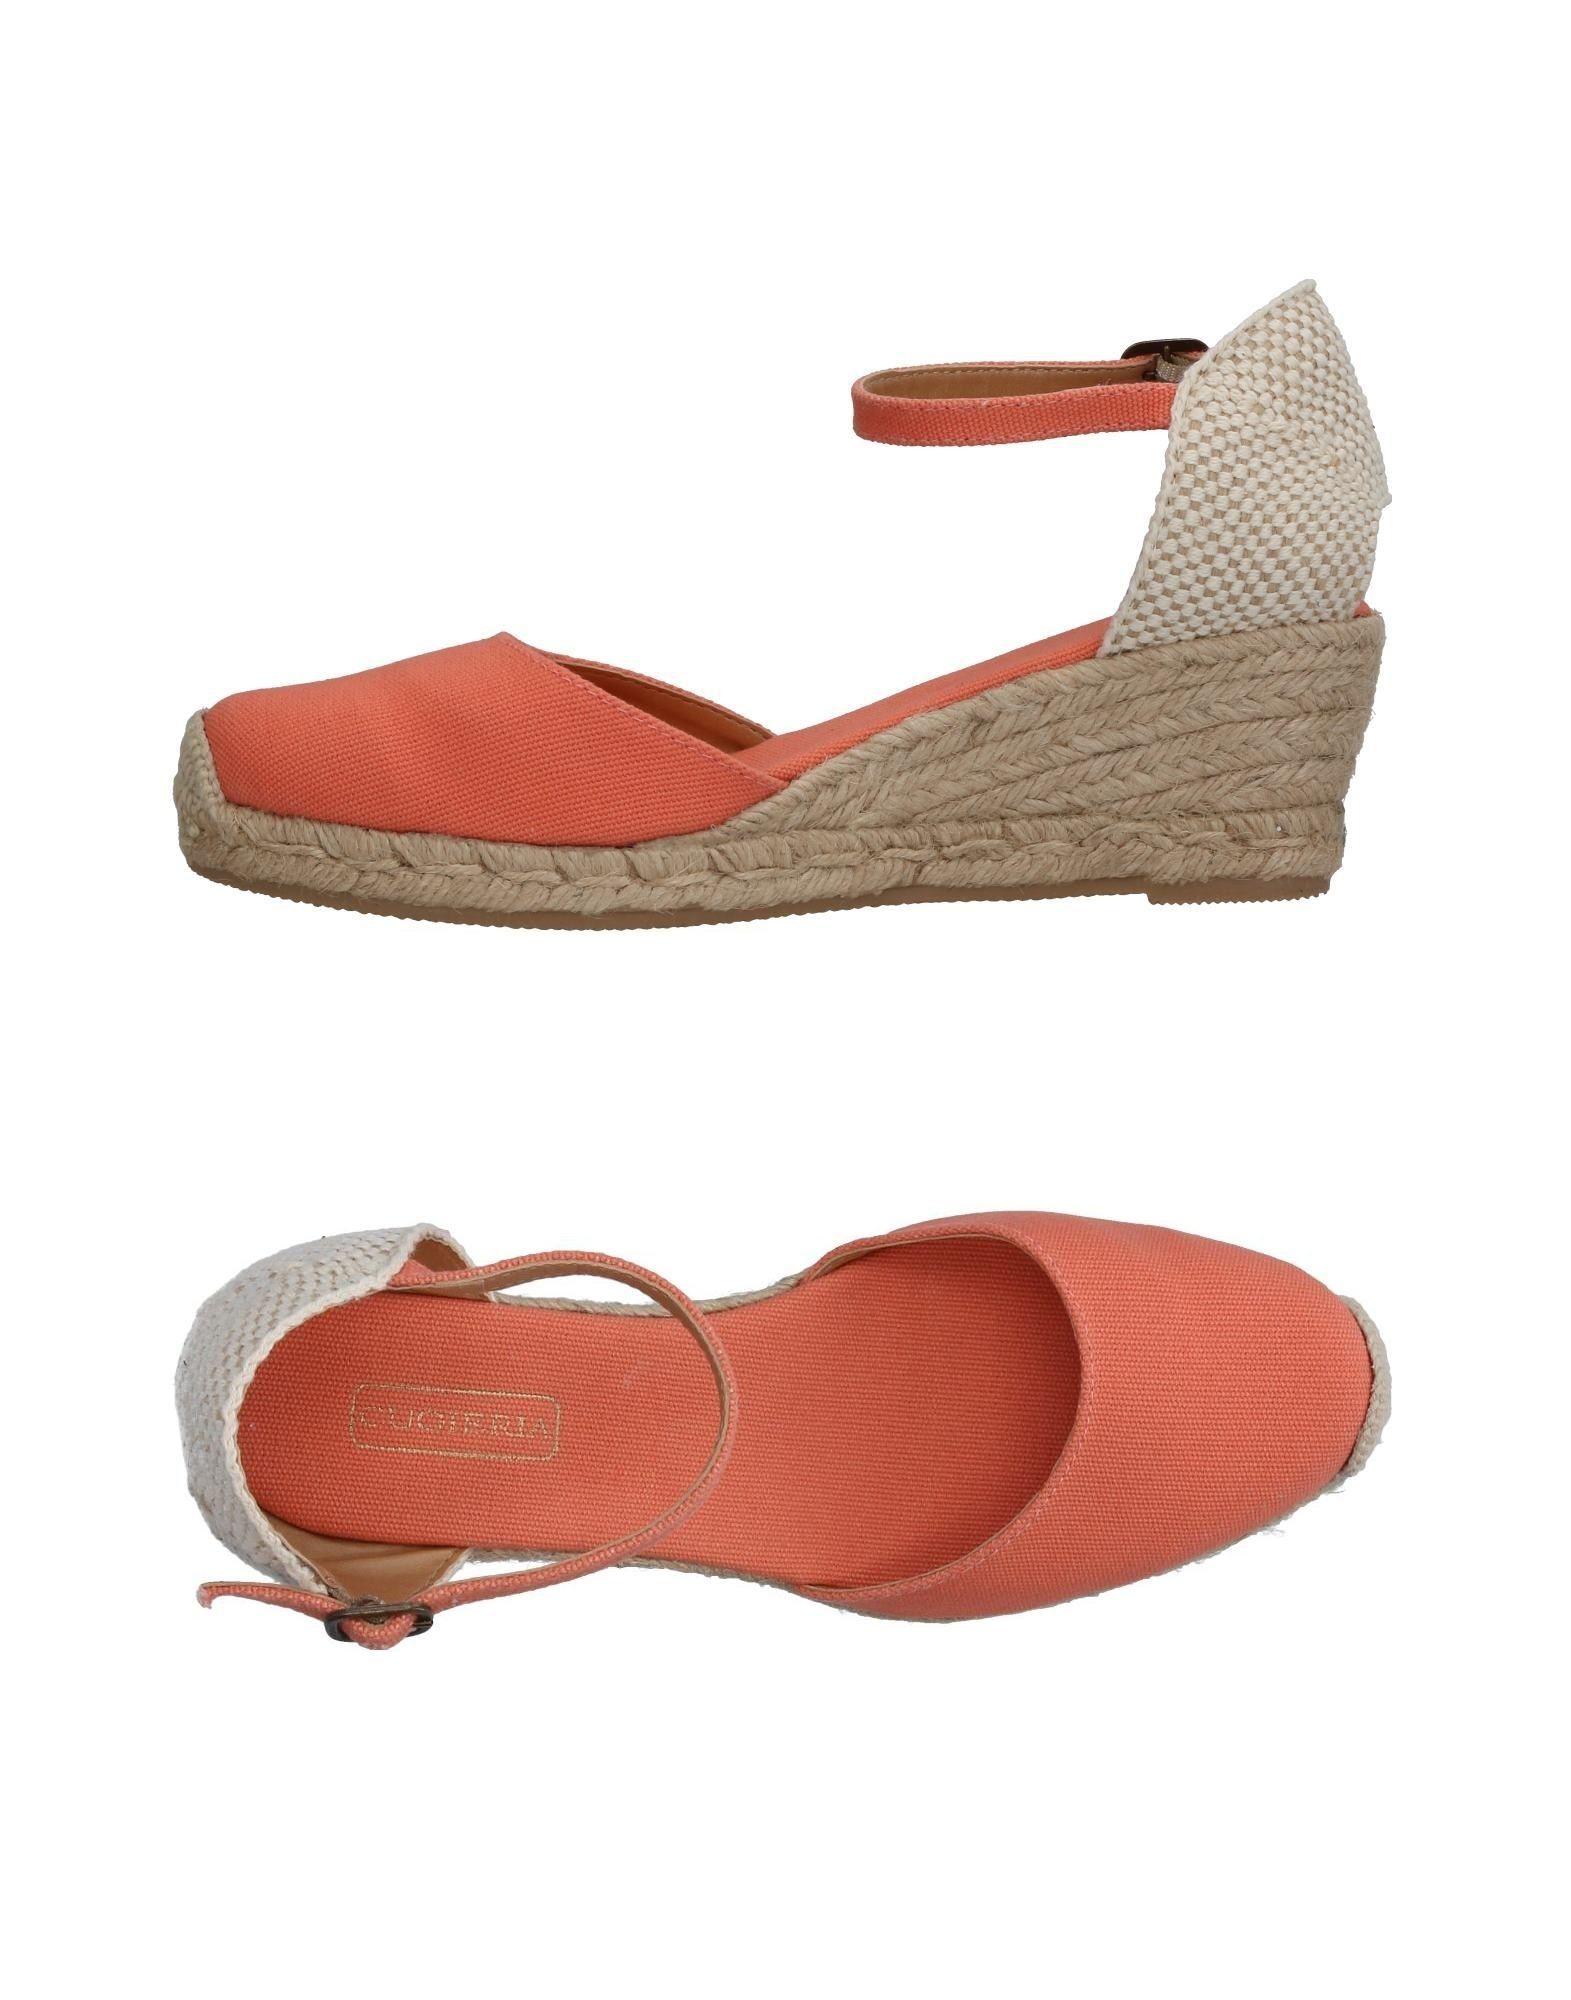 Cuoieria Cuoieria  Espadrilles Damen  11364561BG Heiße Schuhe 45e2a6